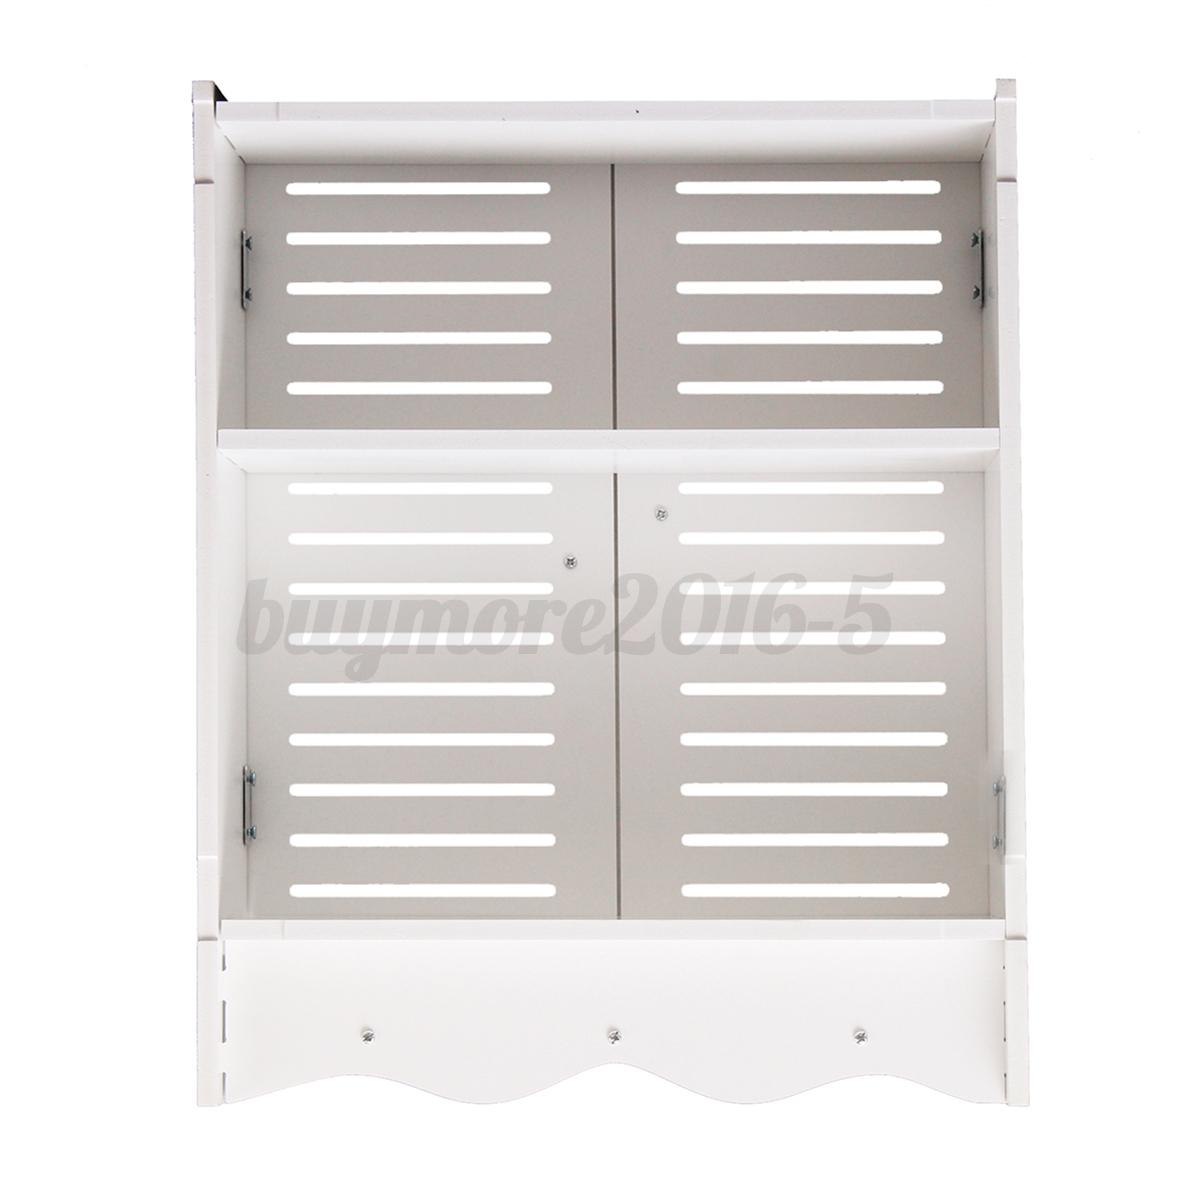 Bathroom cupboard cabinet wall mounted double shutter door for Bathroom designs 7x6